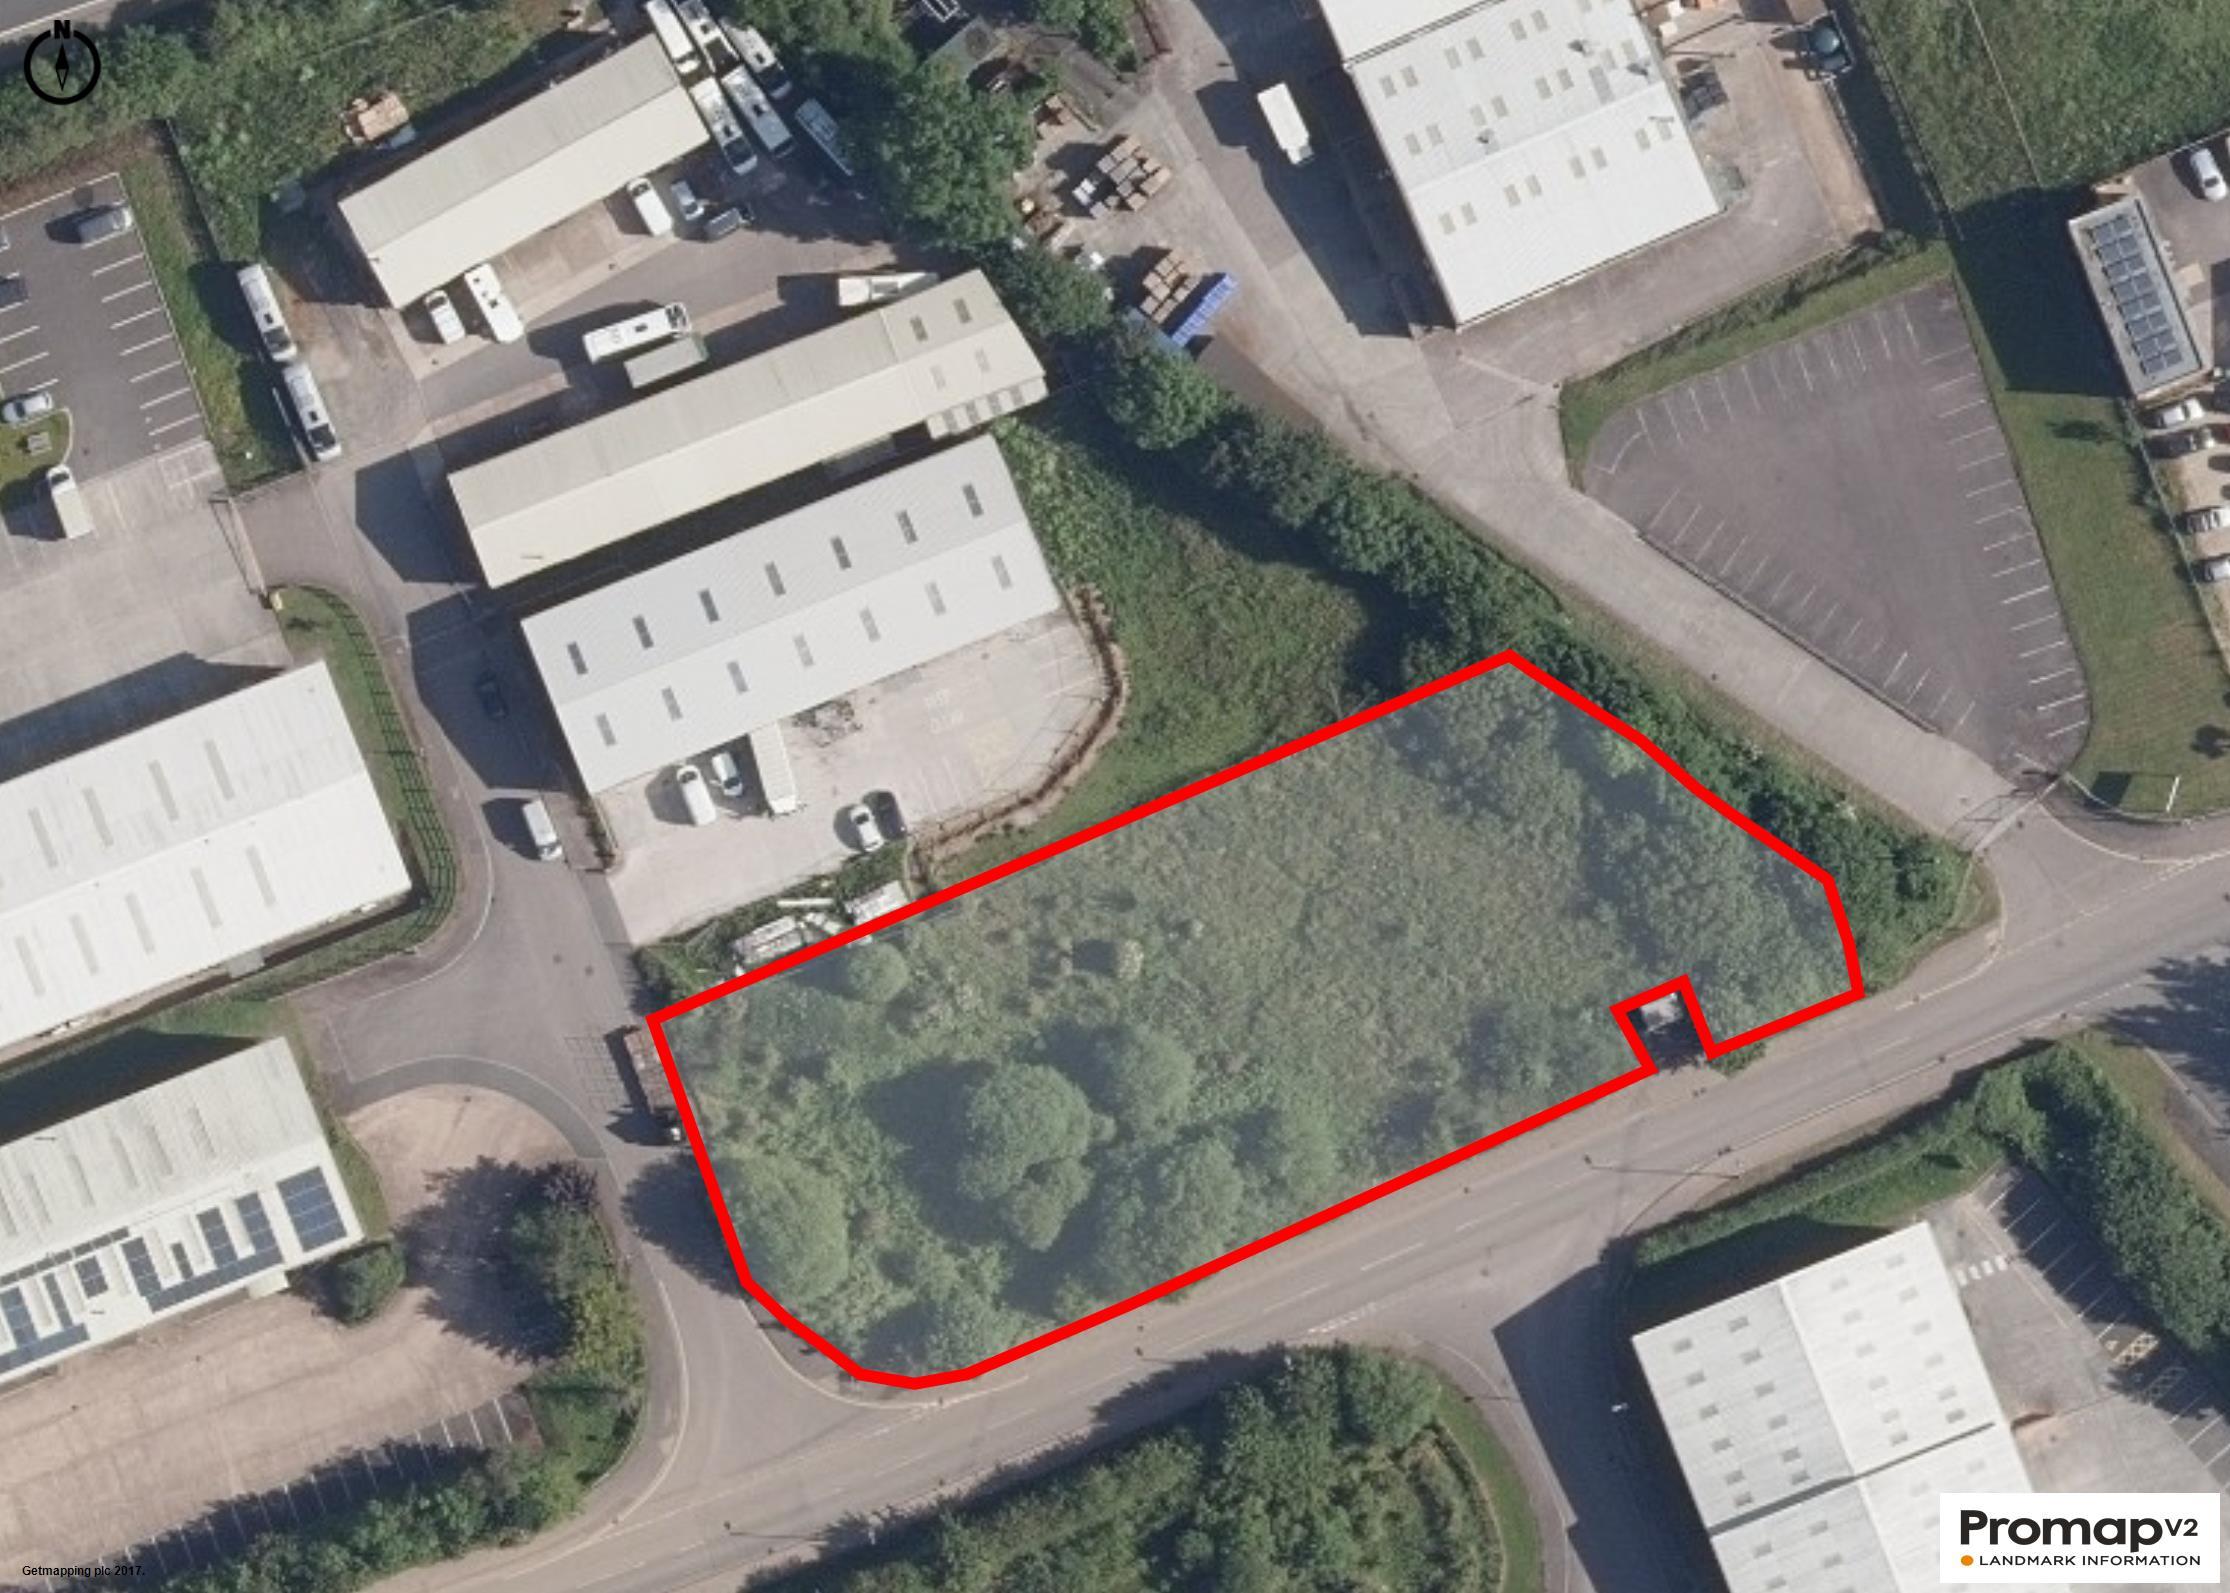 Land at Western Court, HONITON, EX14 1TA